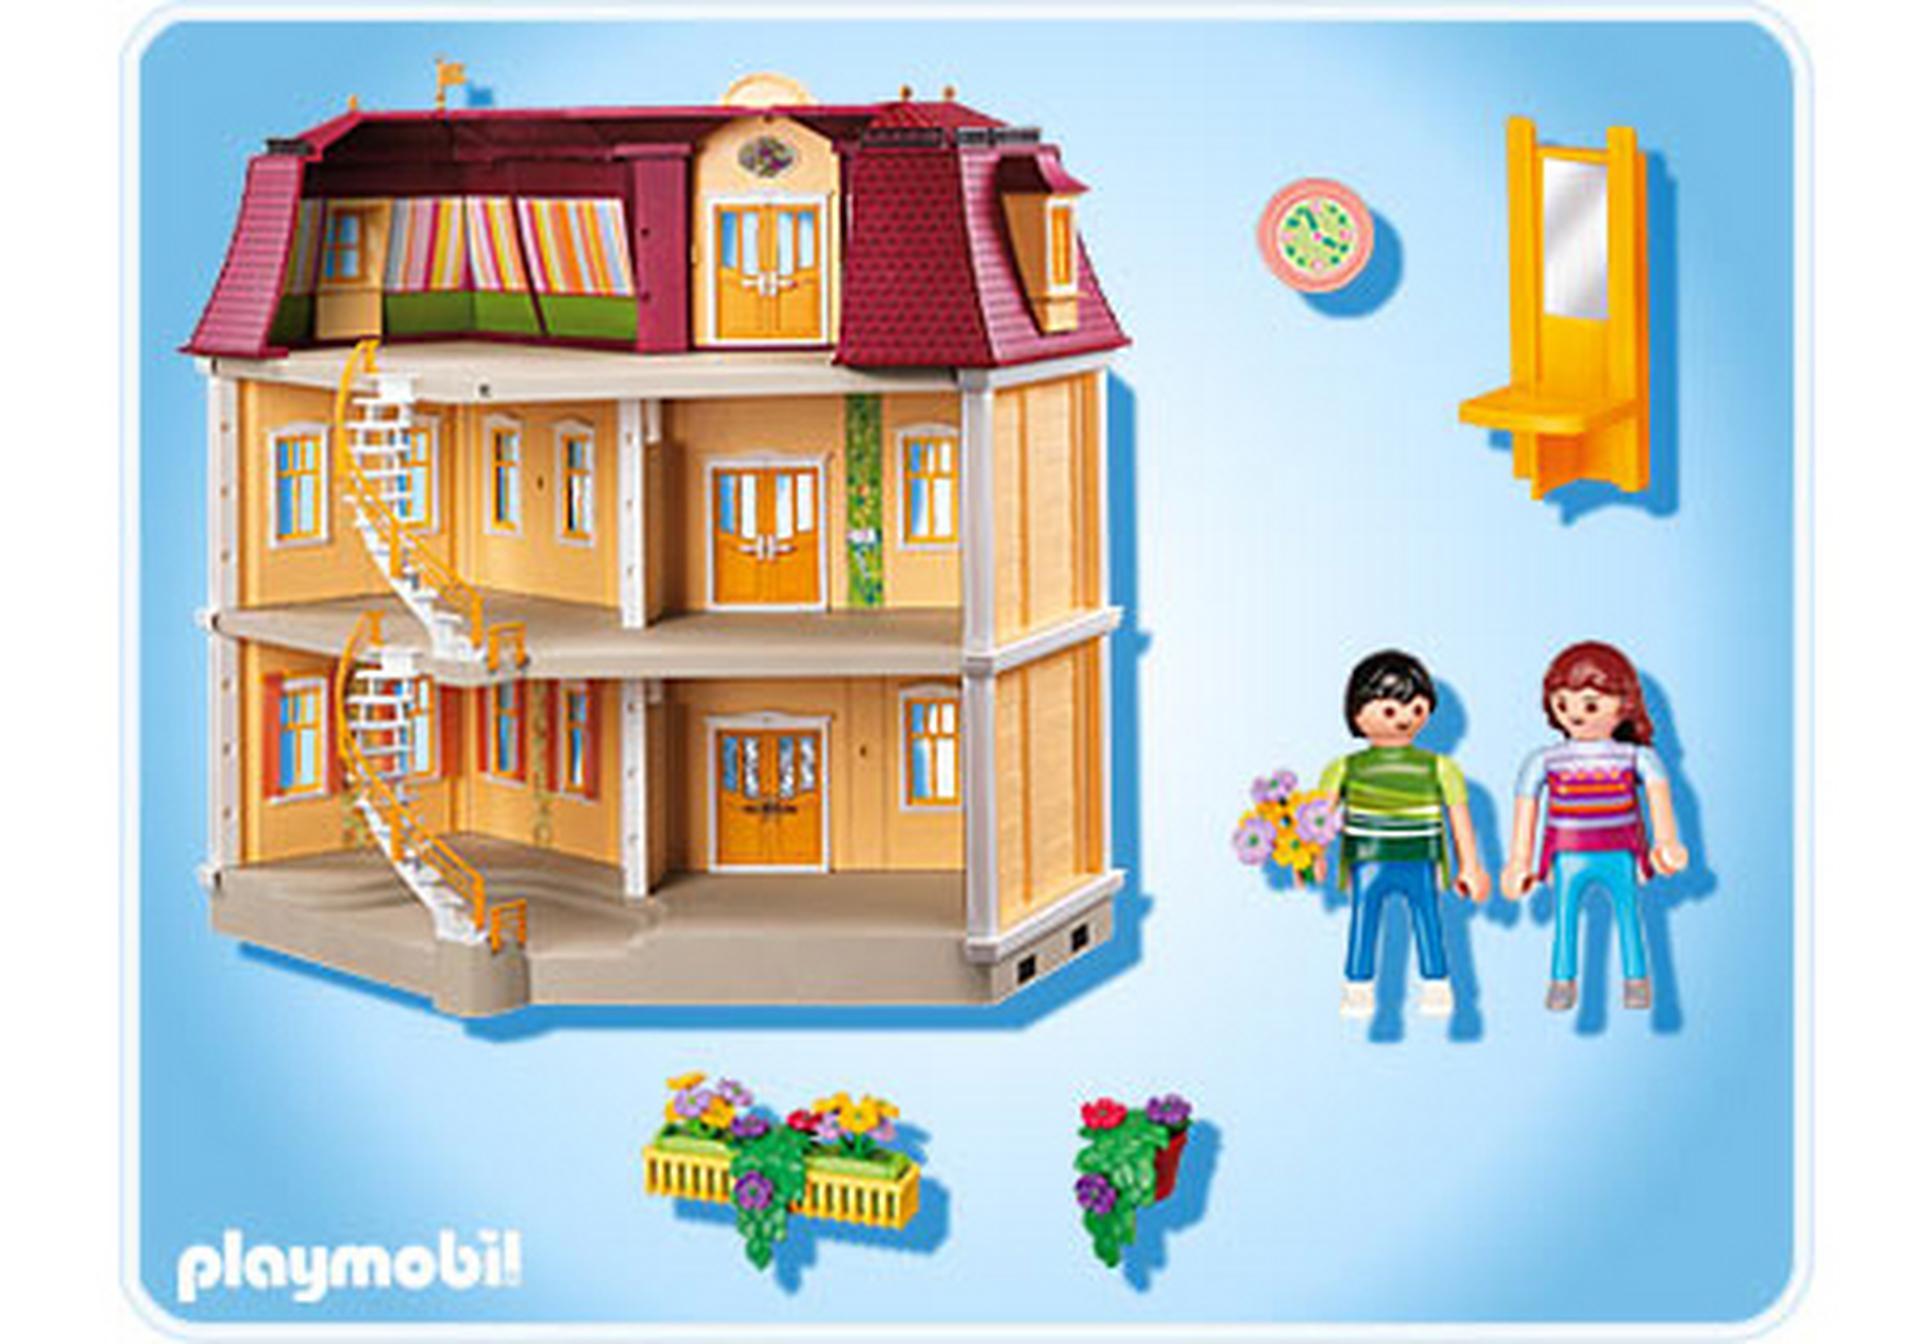 maison de ville 5302 a playmobil france. Black Bedroom Furniture Sets. Home Design Ideas